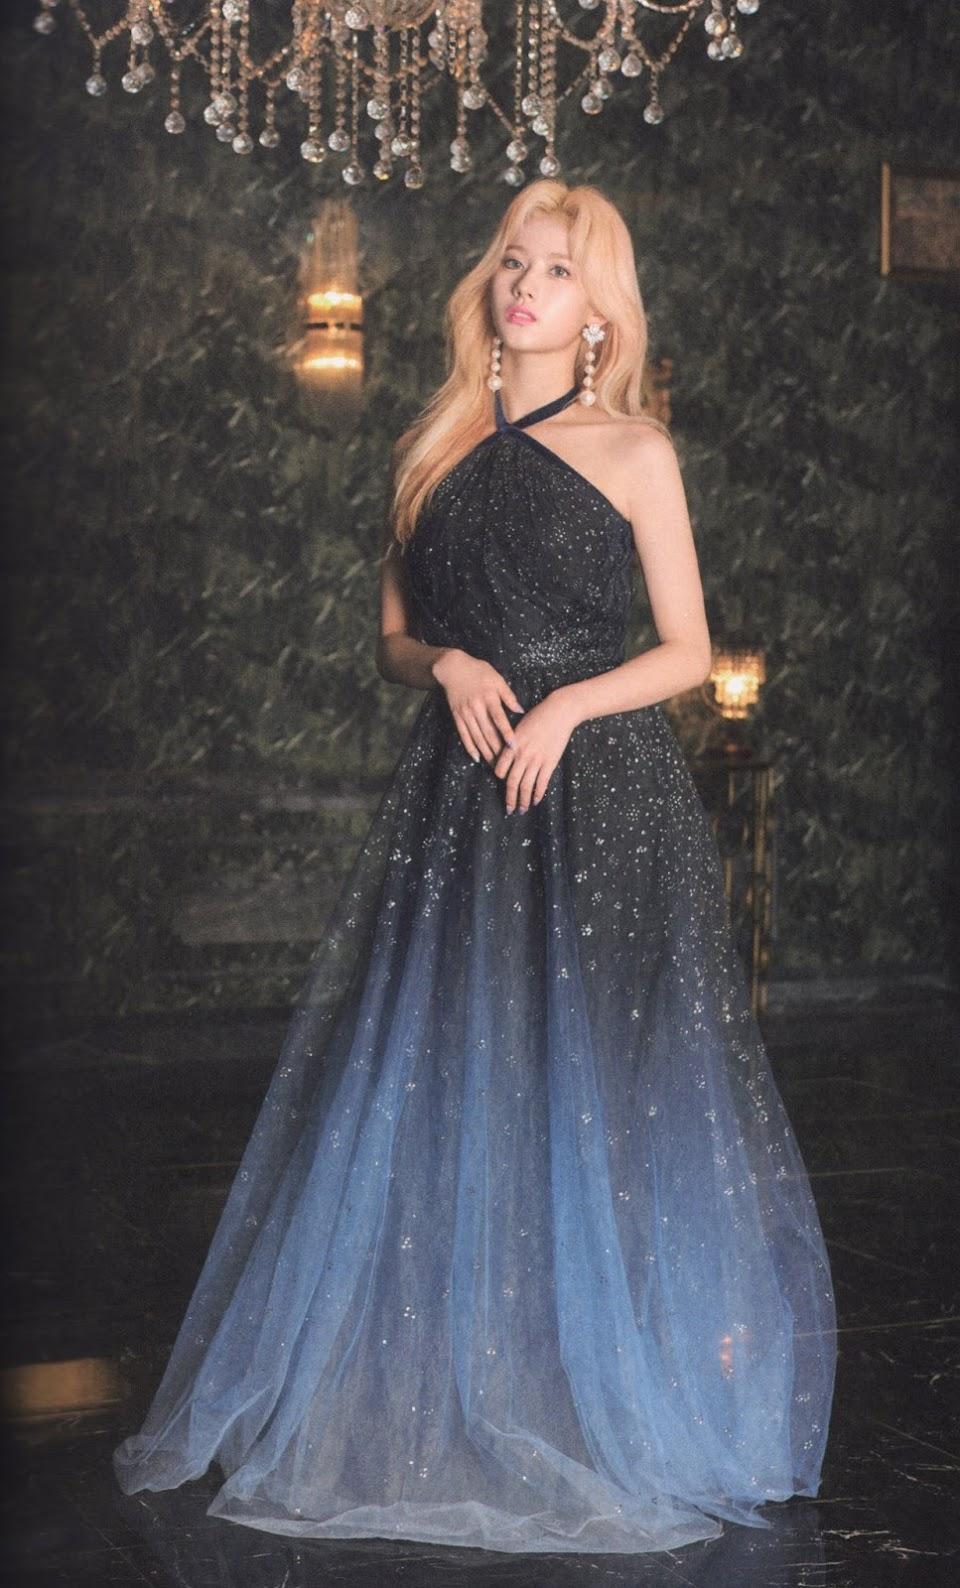 sana dress 7